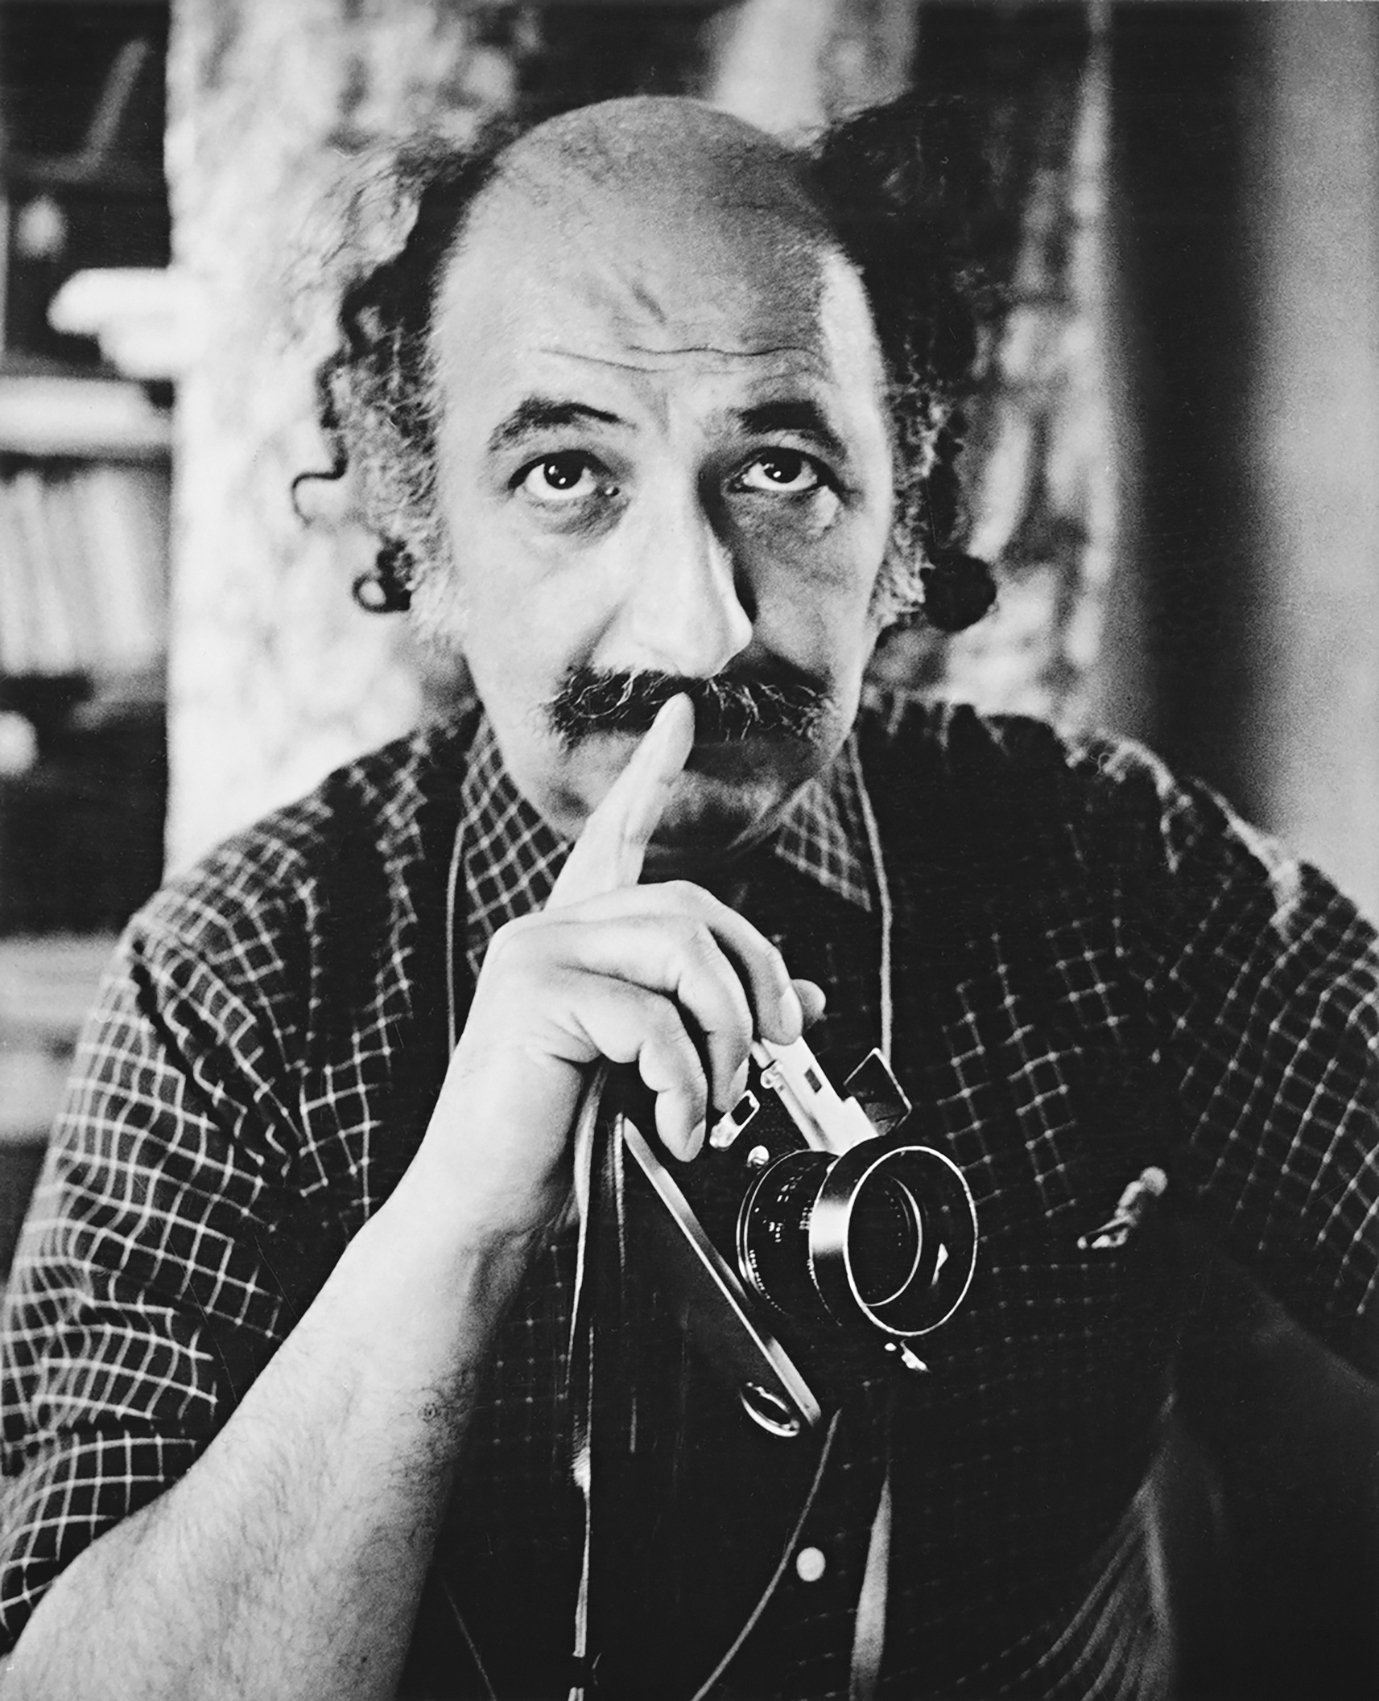 A photo of Ara Güler from the exhibition.